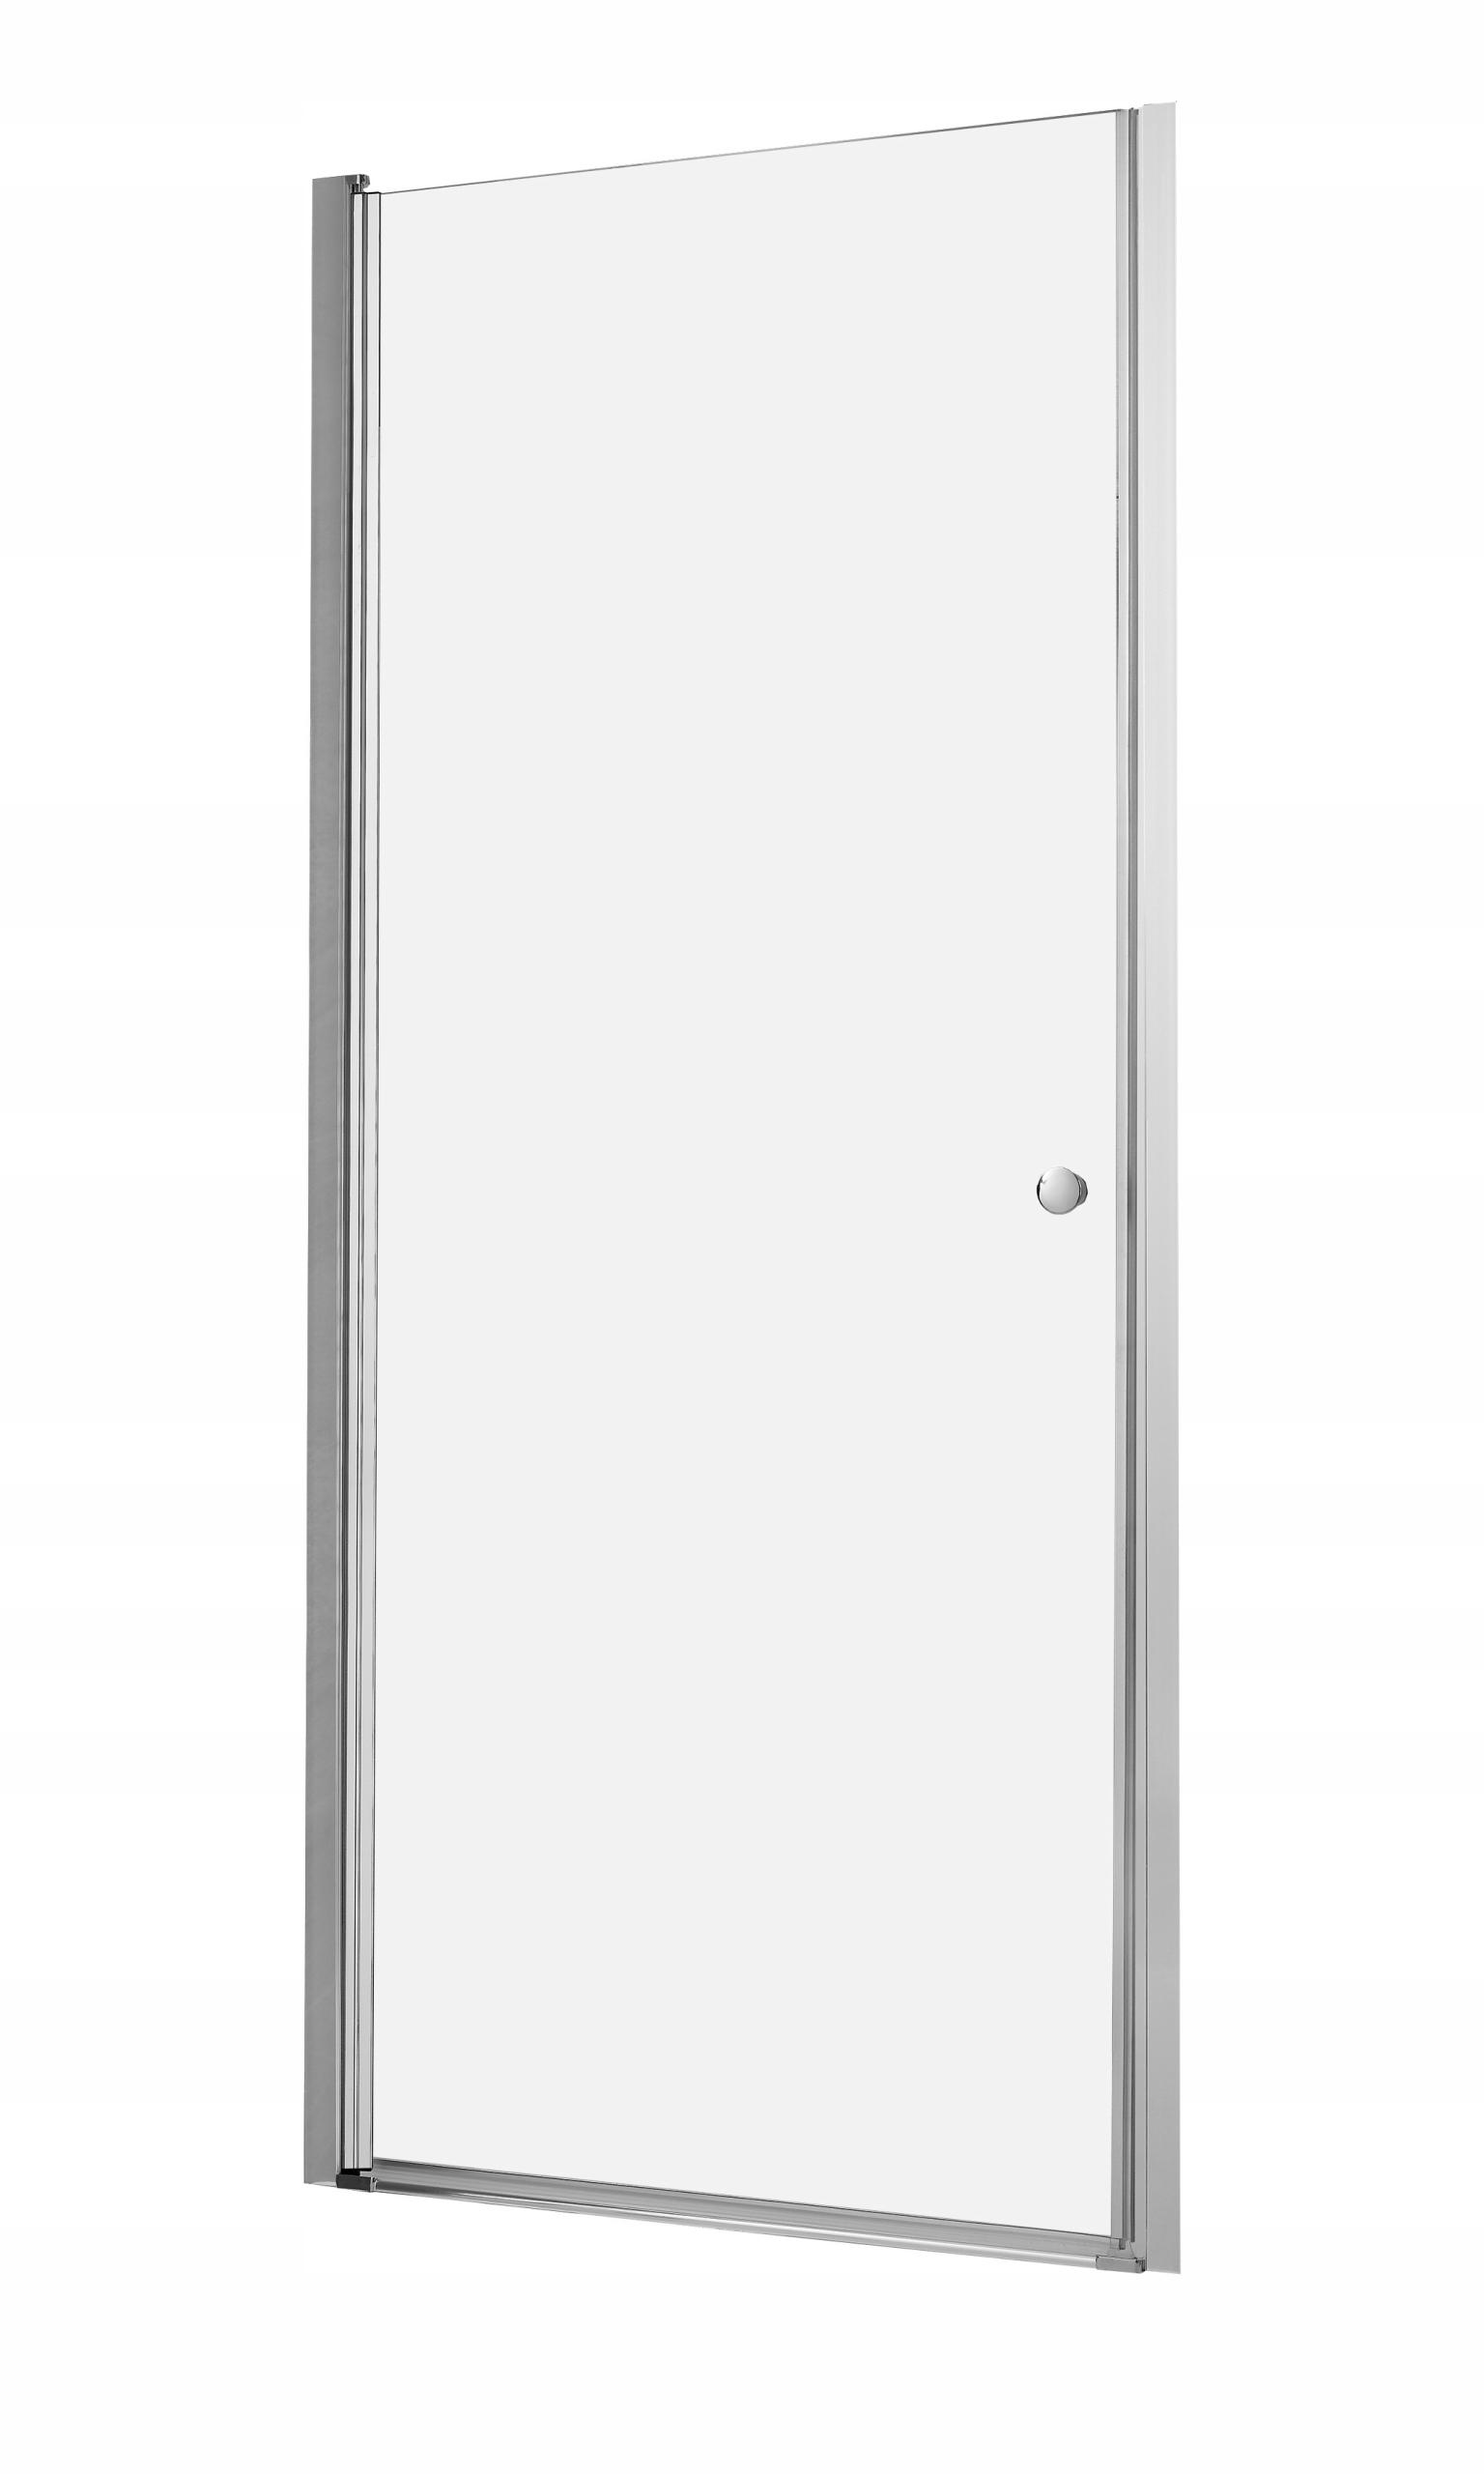 Sprchové dvere Eos DWJ 70x197 cm RADAWAY